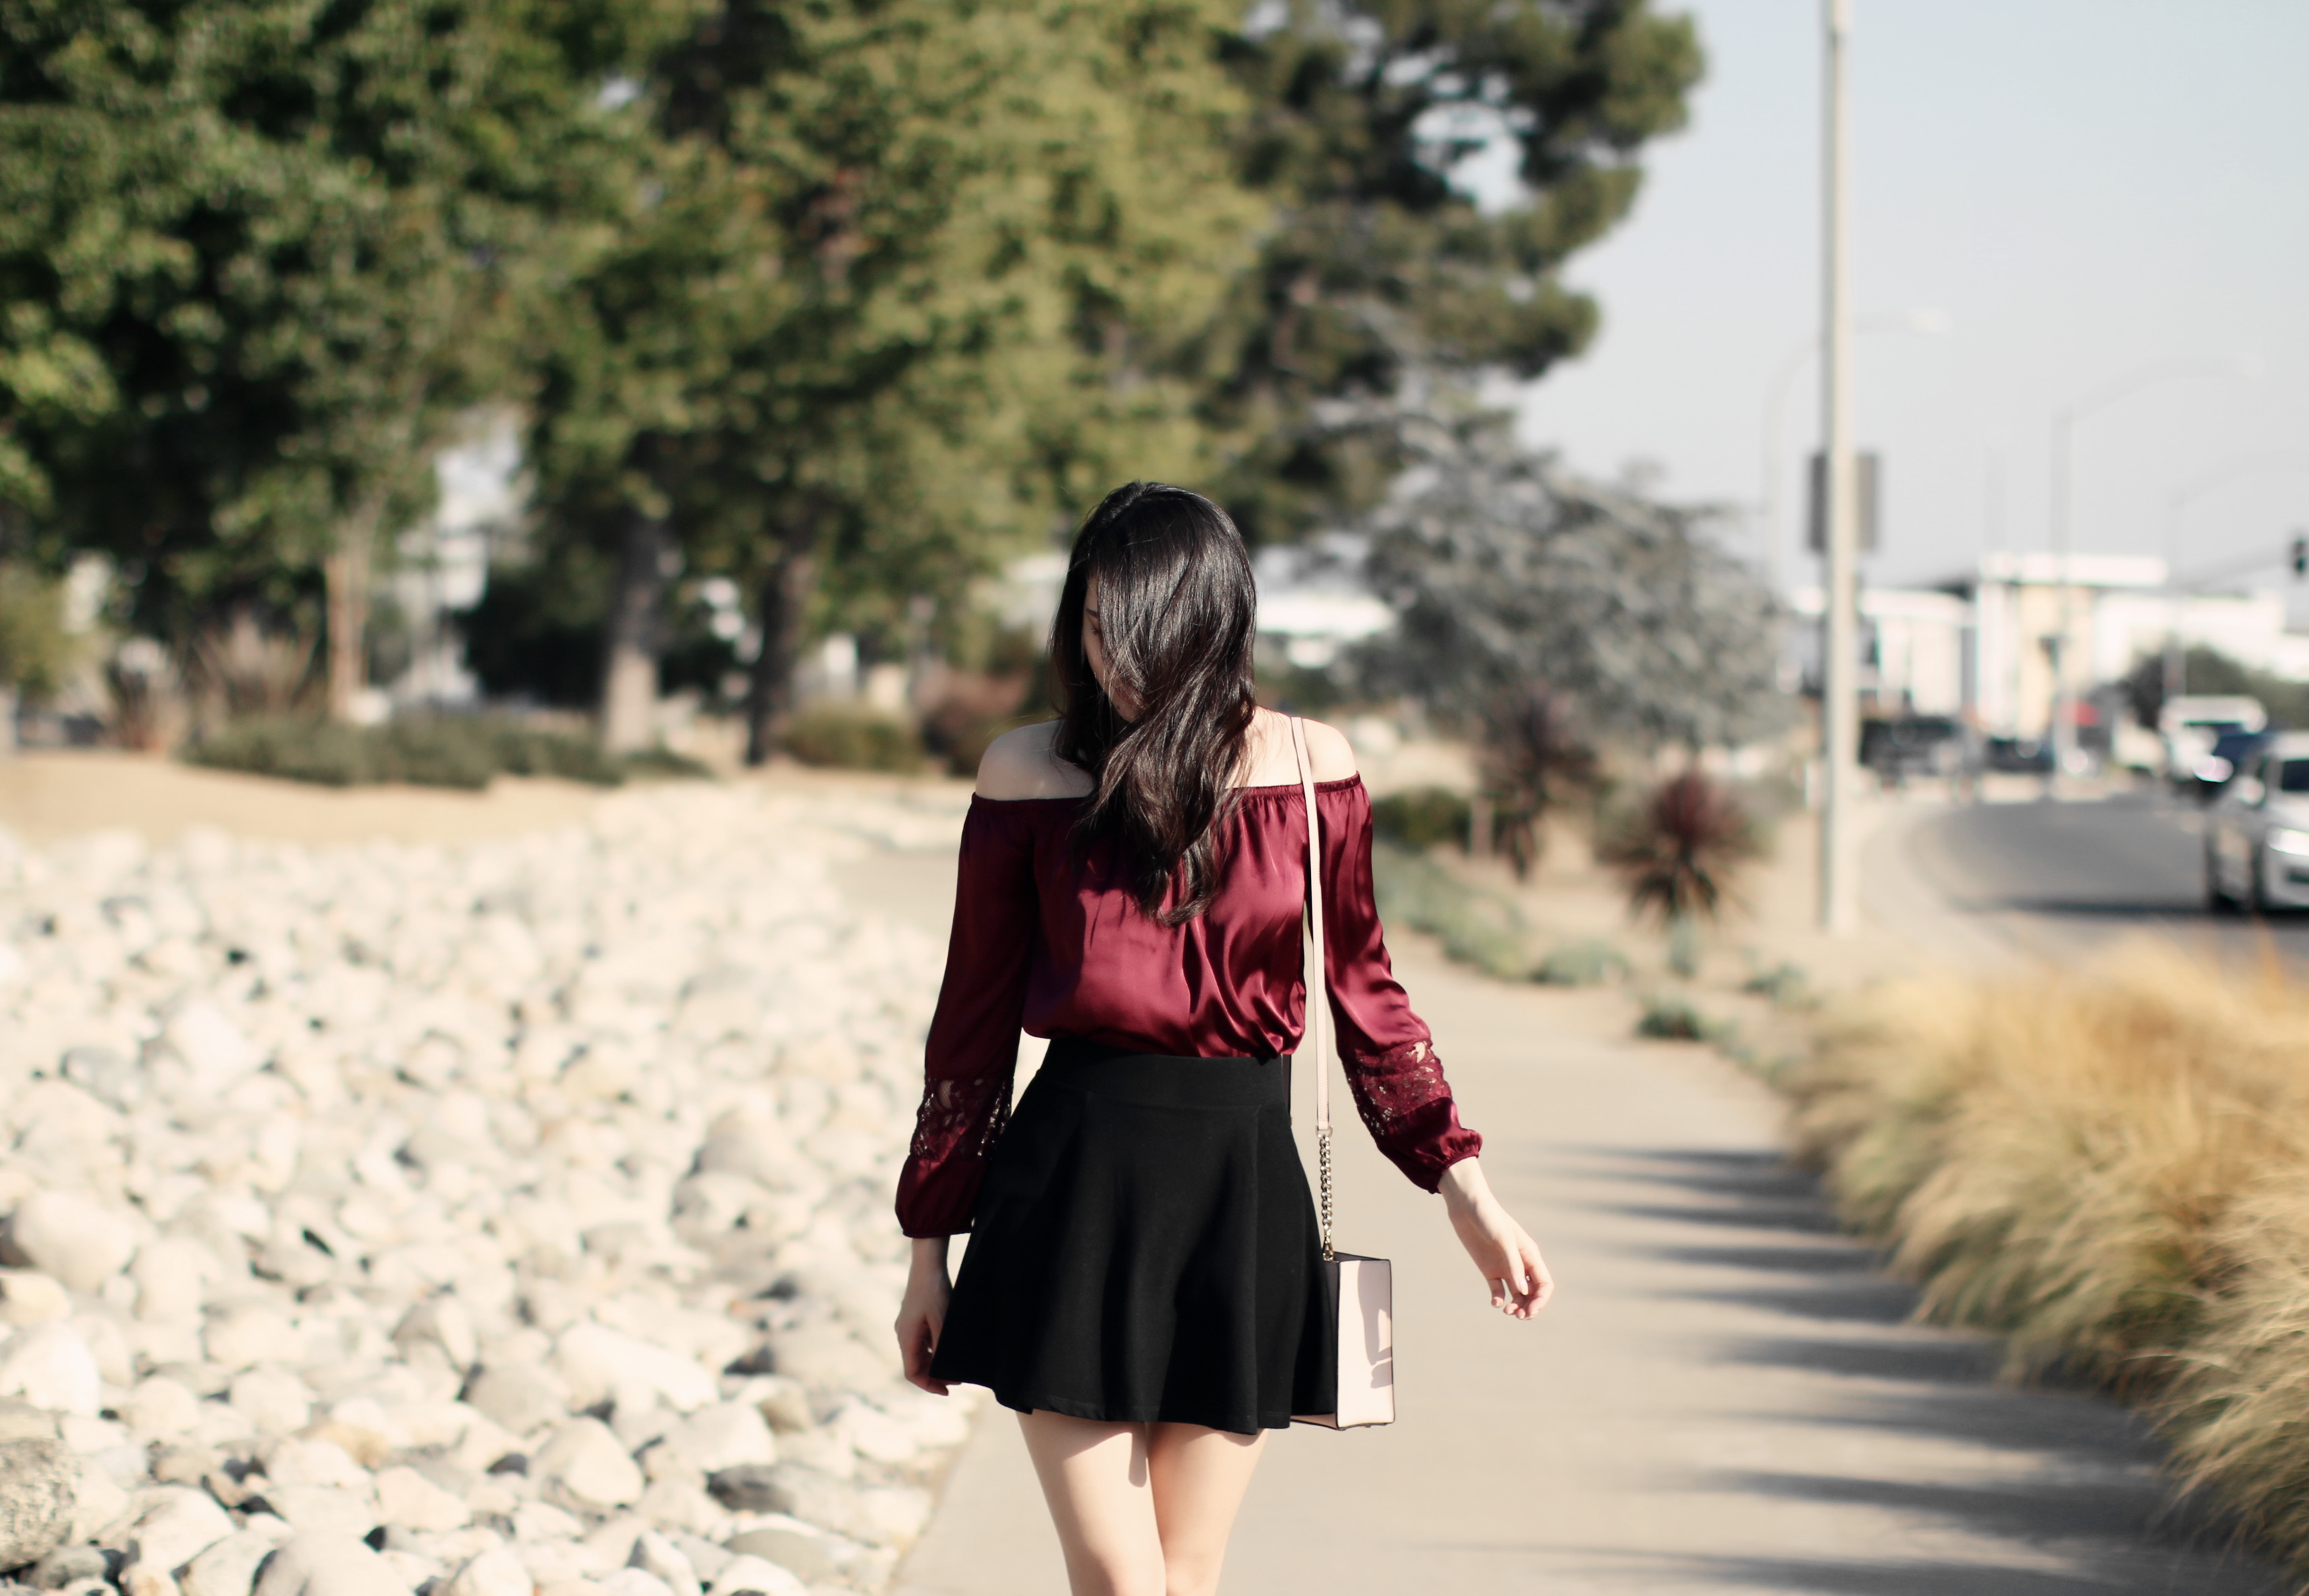 3569-ootd-fashion-style-outfitoftheday-wiwt-silk-lace-fallfashion-forever21-f21xme-elizabeeetht-clothestoyouuu